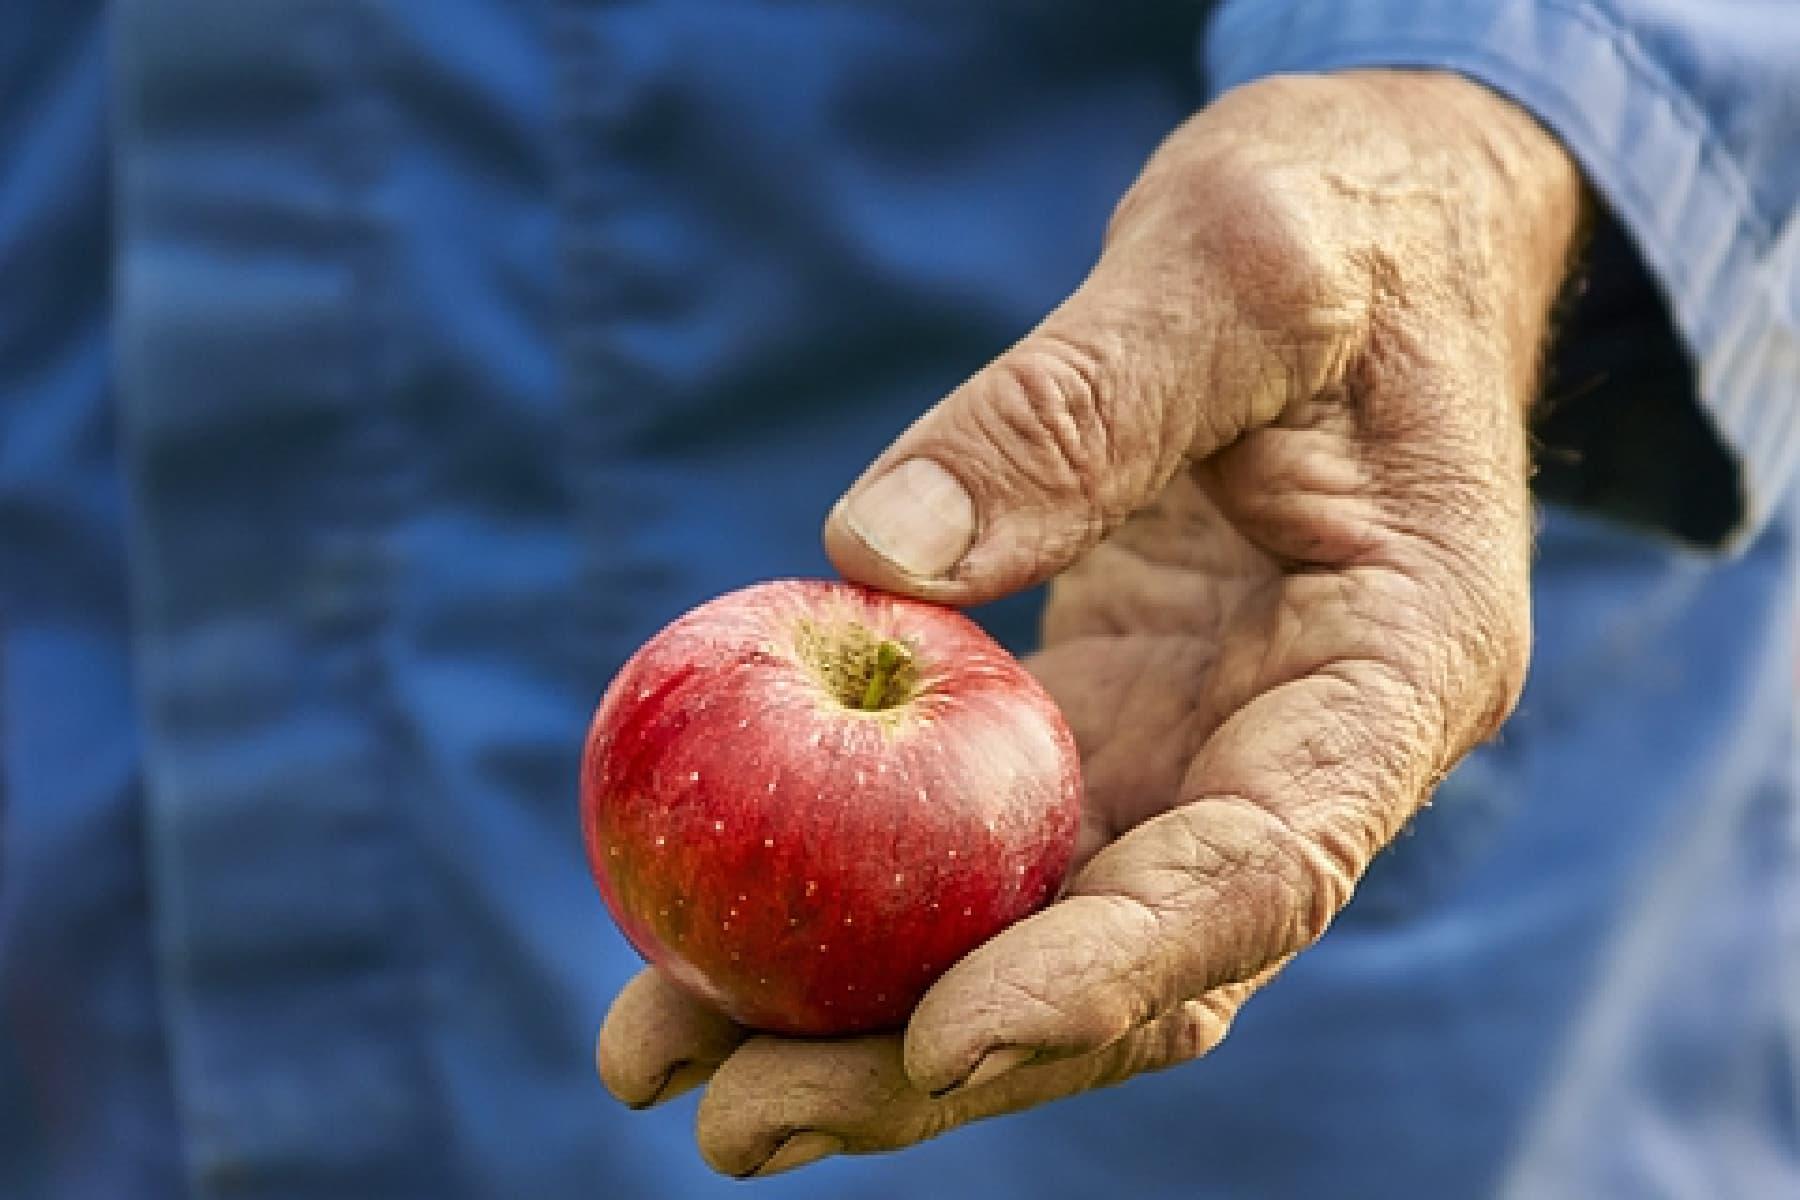 Studie zum Apfel